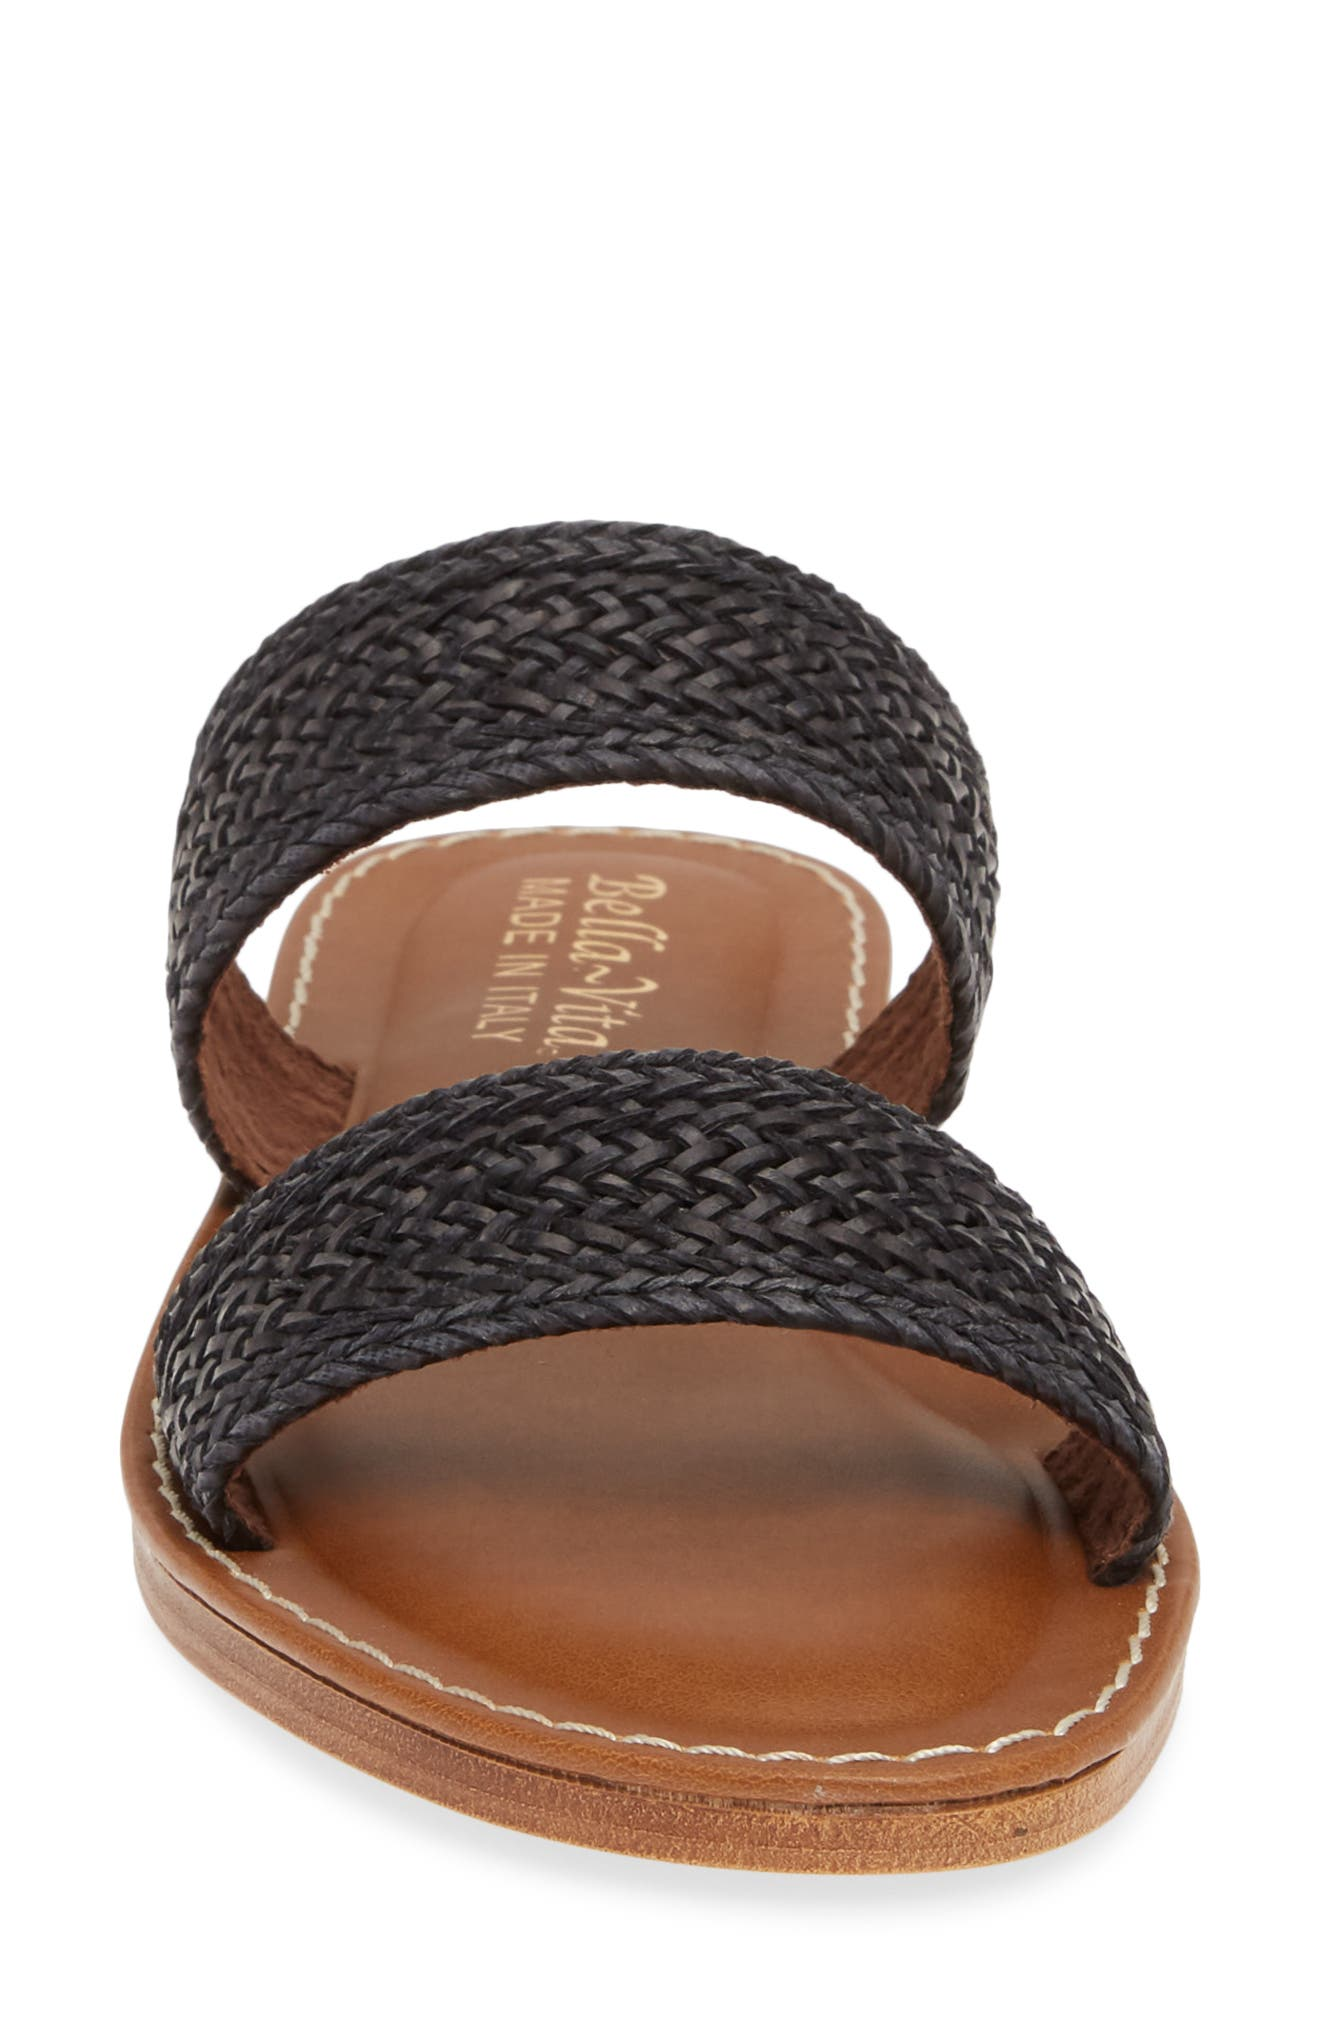 BELLA VITA, Two-Strap Slide Sandal, Alternate thumbnail 4, color, BLACK WOVEN